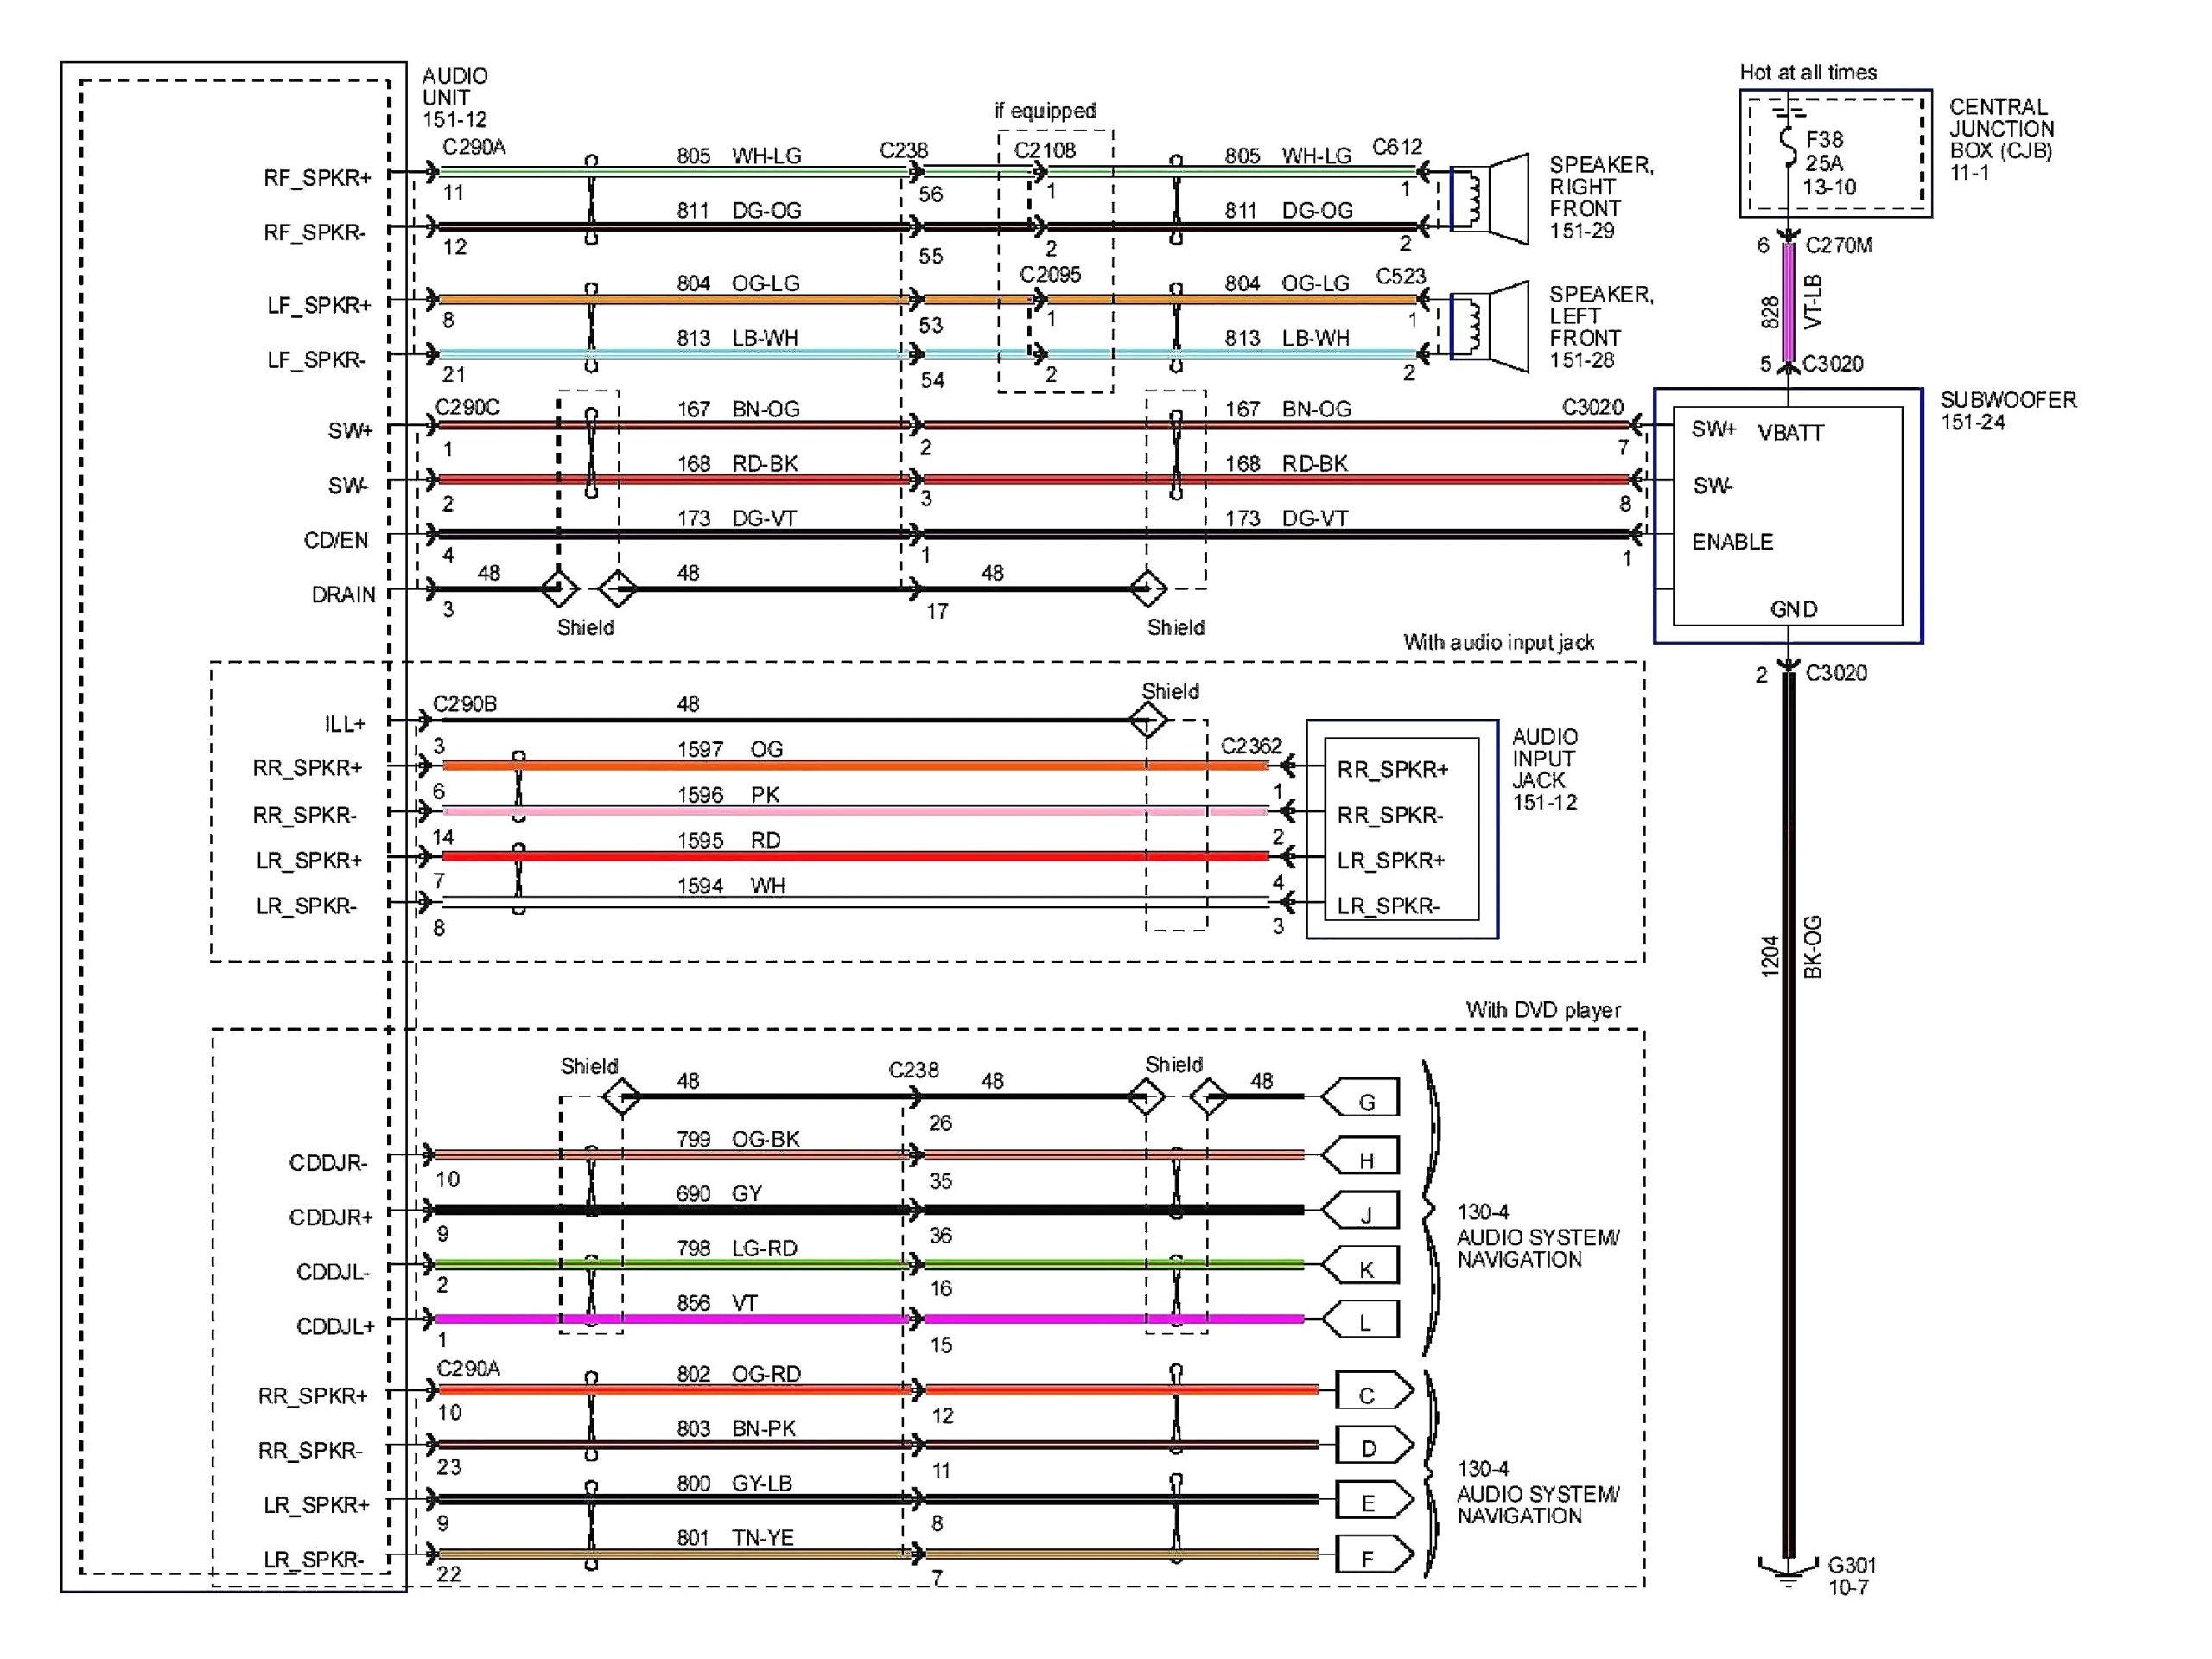 2019 Jetta Stereo Wiring Diagram Chevy Express Radio Wiring Diagram Main Fuse9 Klictravel Nl